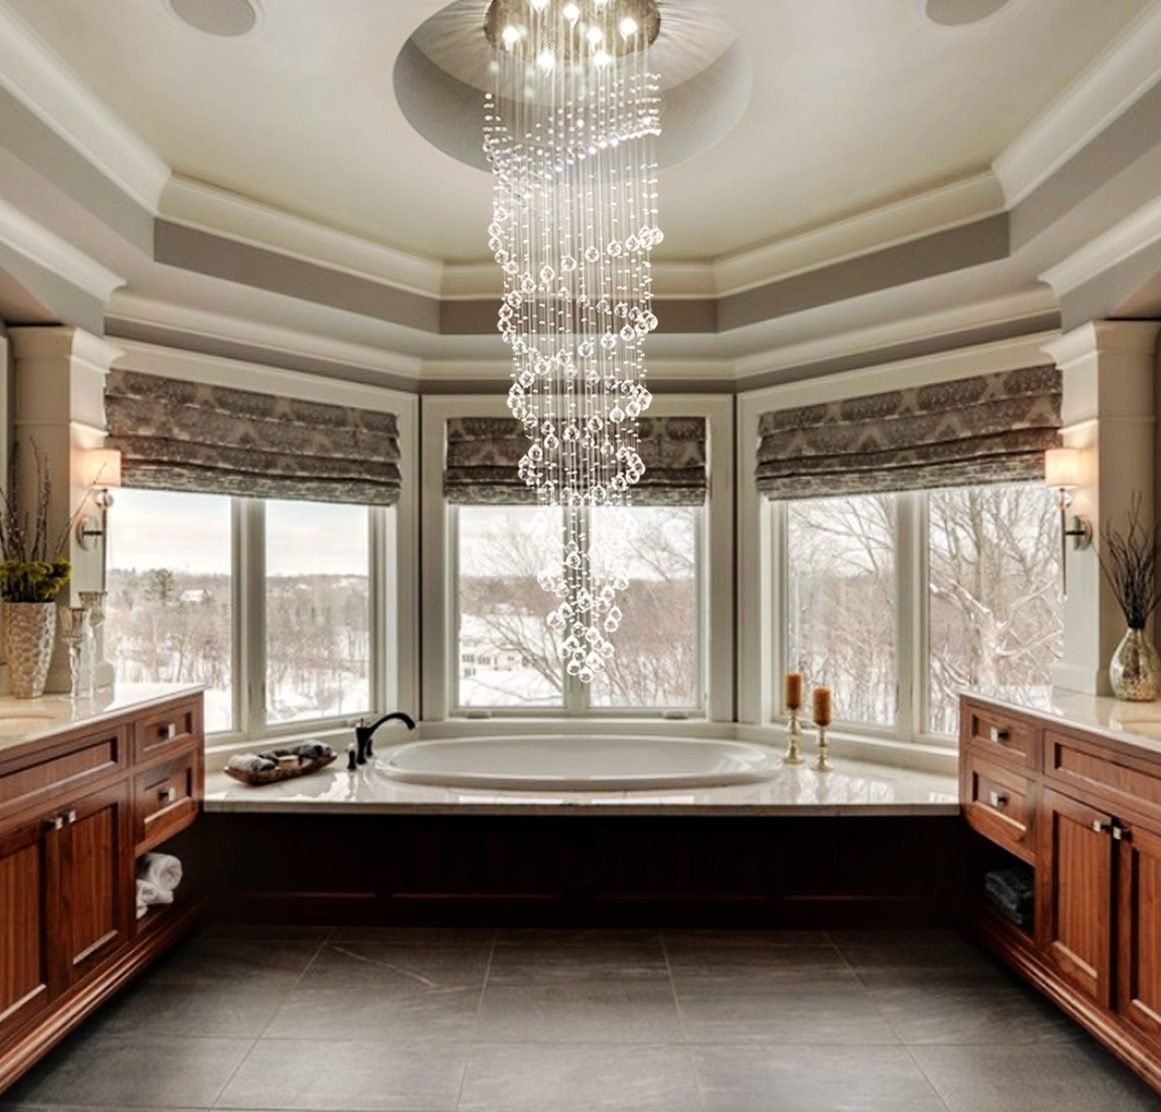 Saint Mossi Modern K9 Crystal Raindrop Chandelier Lighting Flush Mount Led Ceiling Light Fixture Pendant Lamp For Dining Room Bathroom Bedroom Livingroom